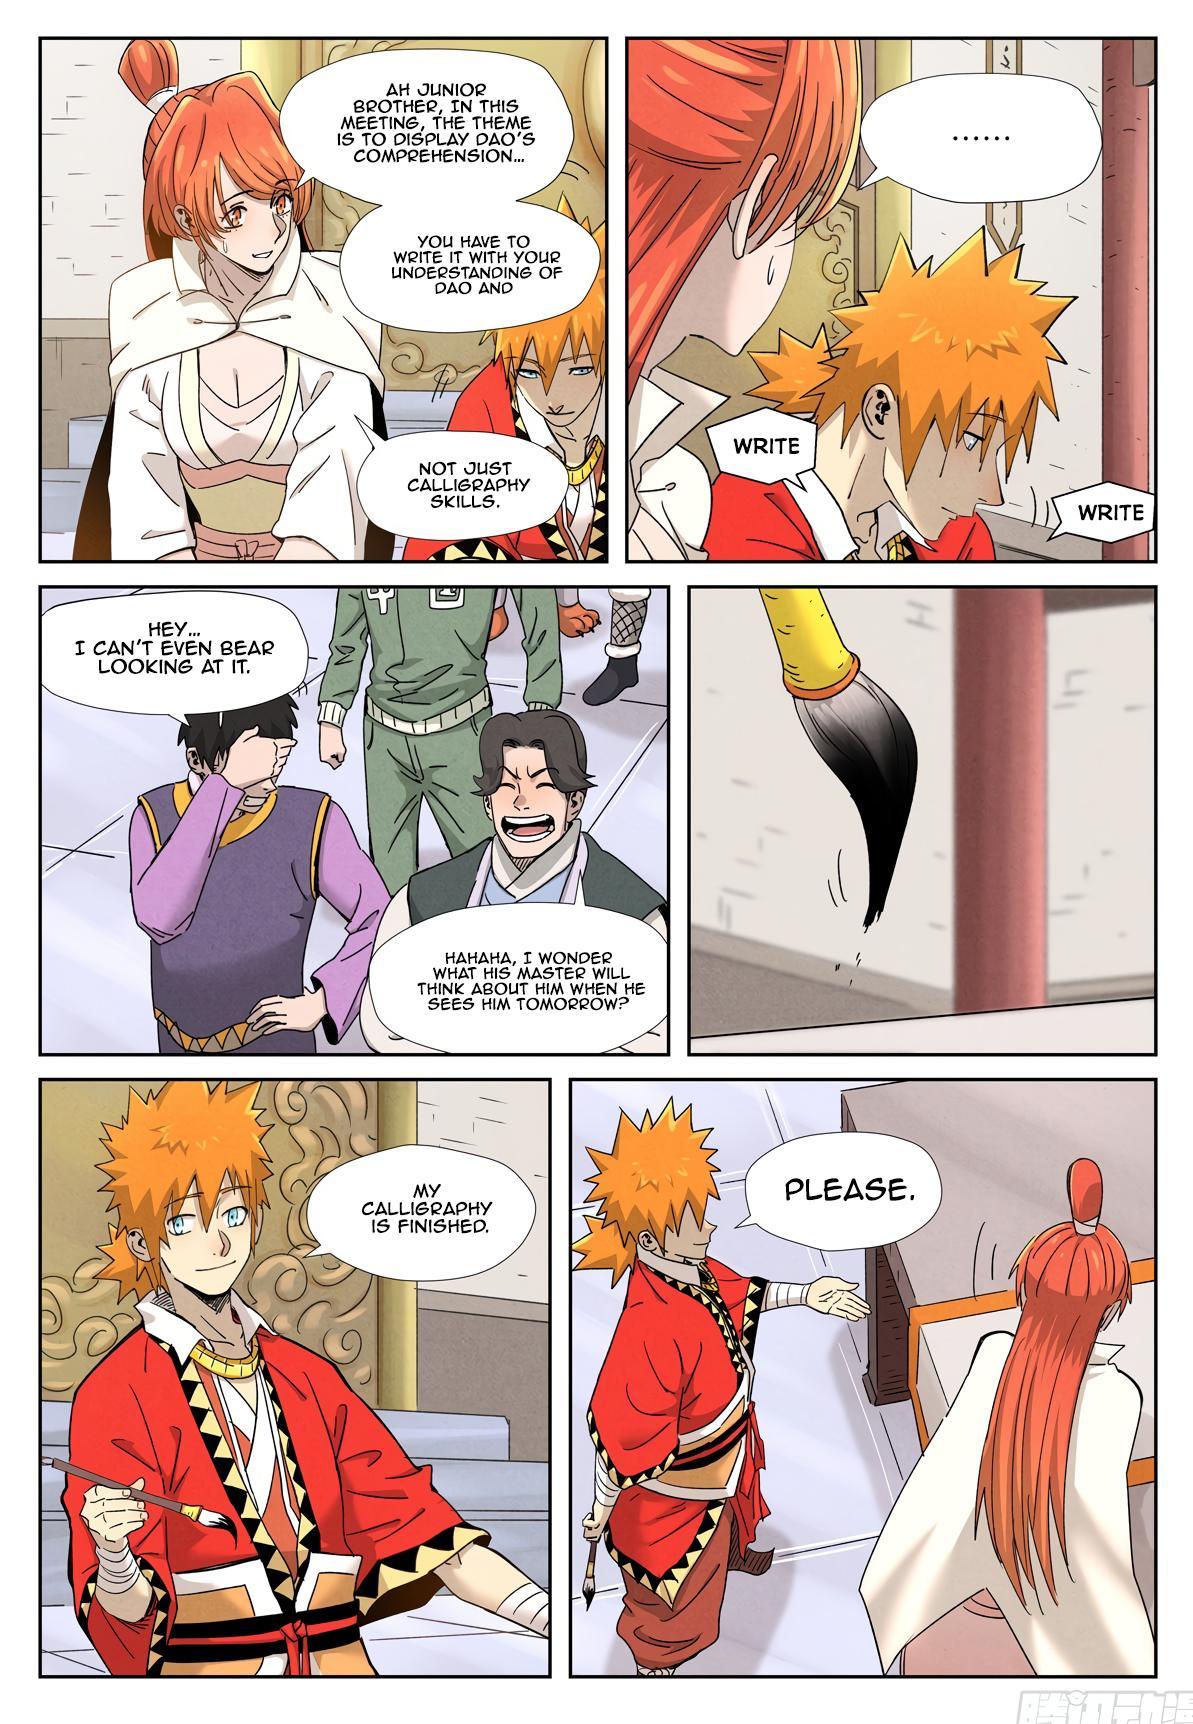 Tales Of Demons And Gods Chapter 341.1 page 9 - Mangakakalot